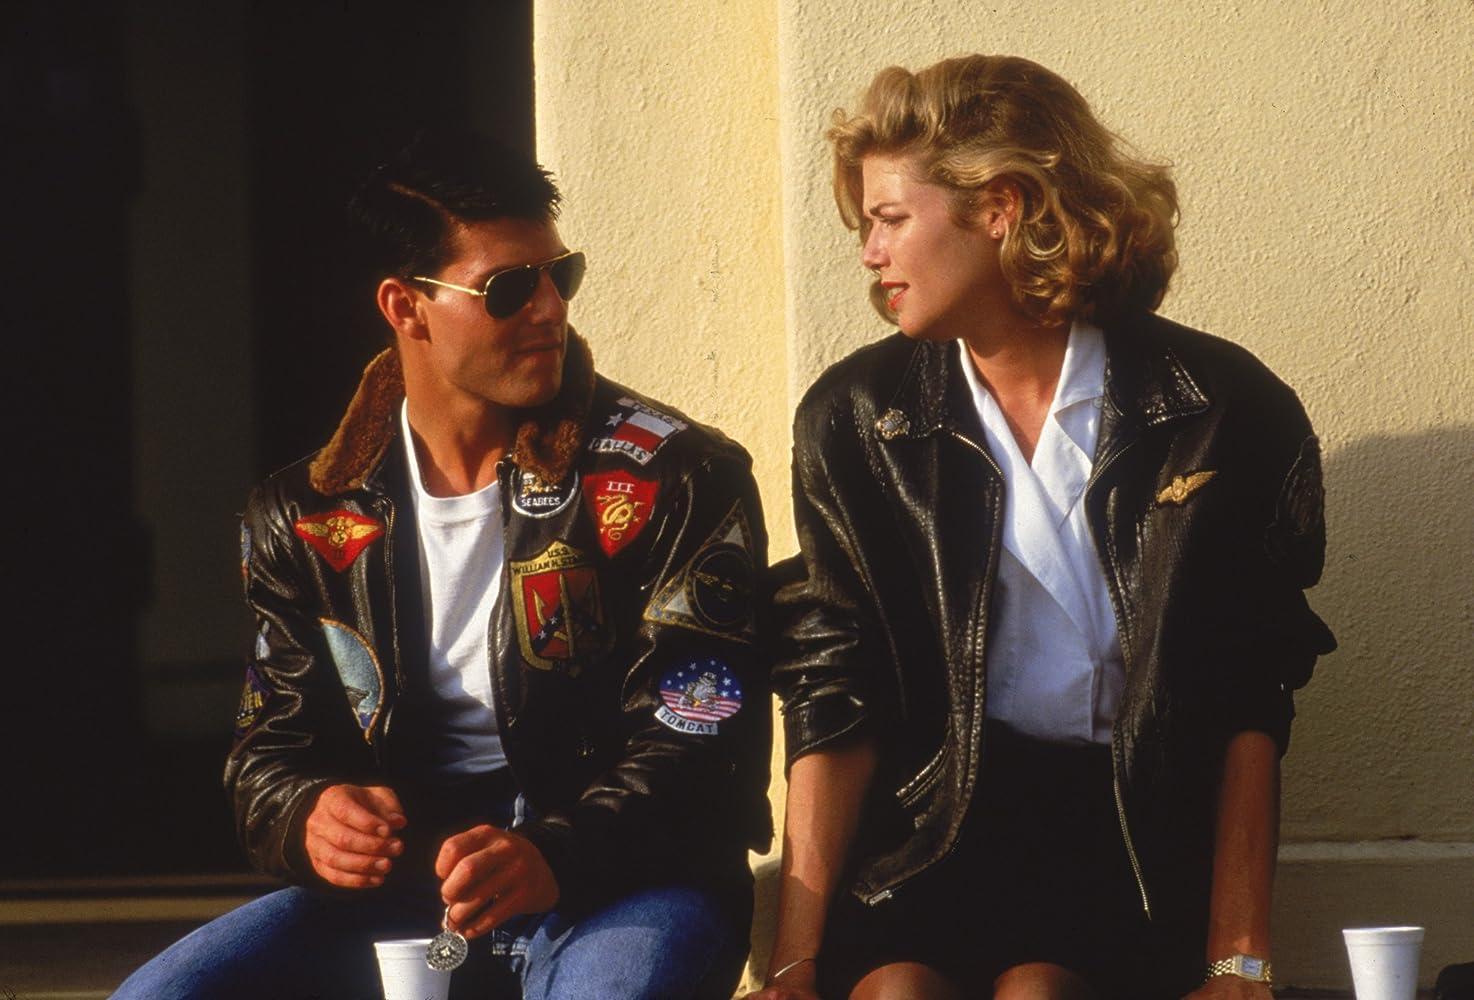 Tom Cruise and Kelly McGillis in Top Gun (1986)